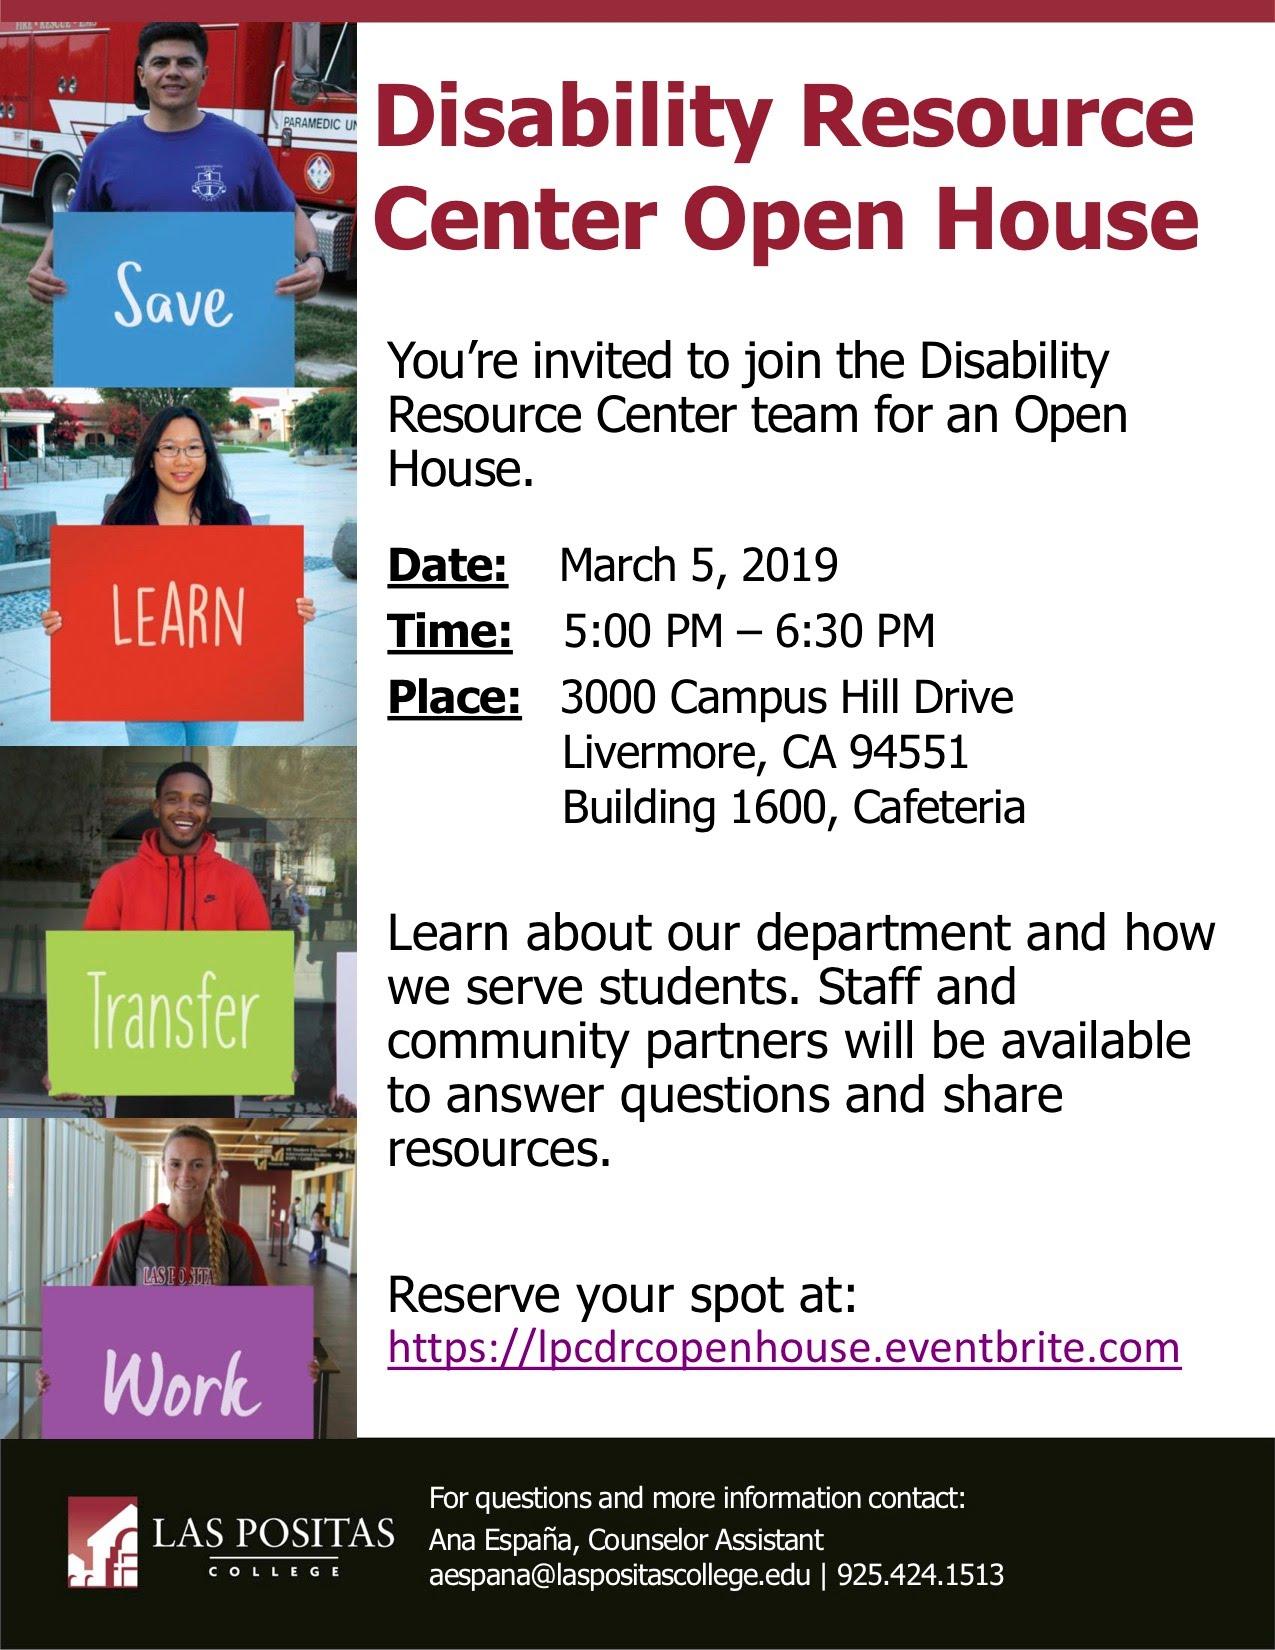 https://www.eventbrite.com/e/las-positas-college-disability-resource-center-open-house-tickets-55717774363